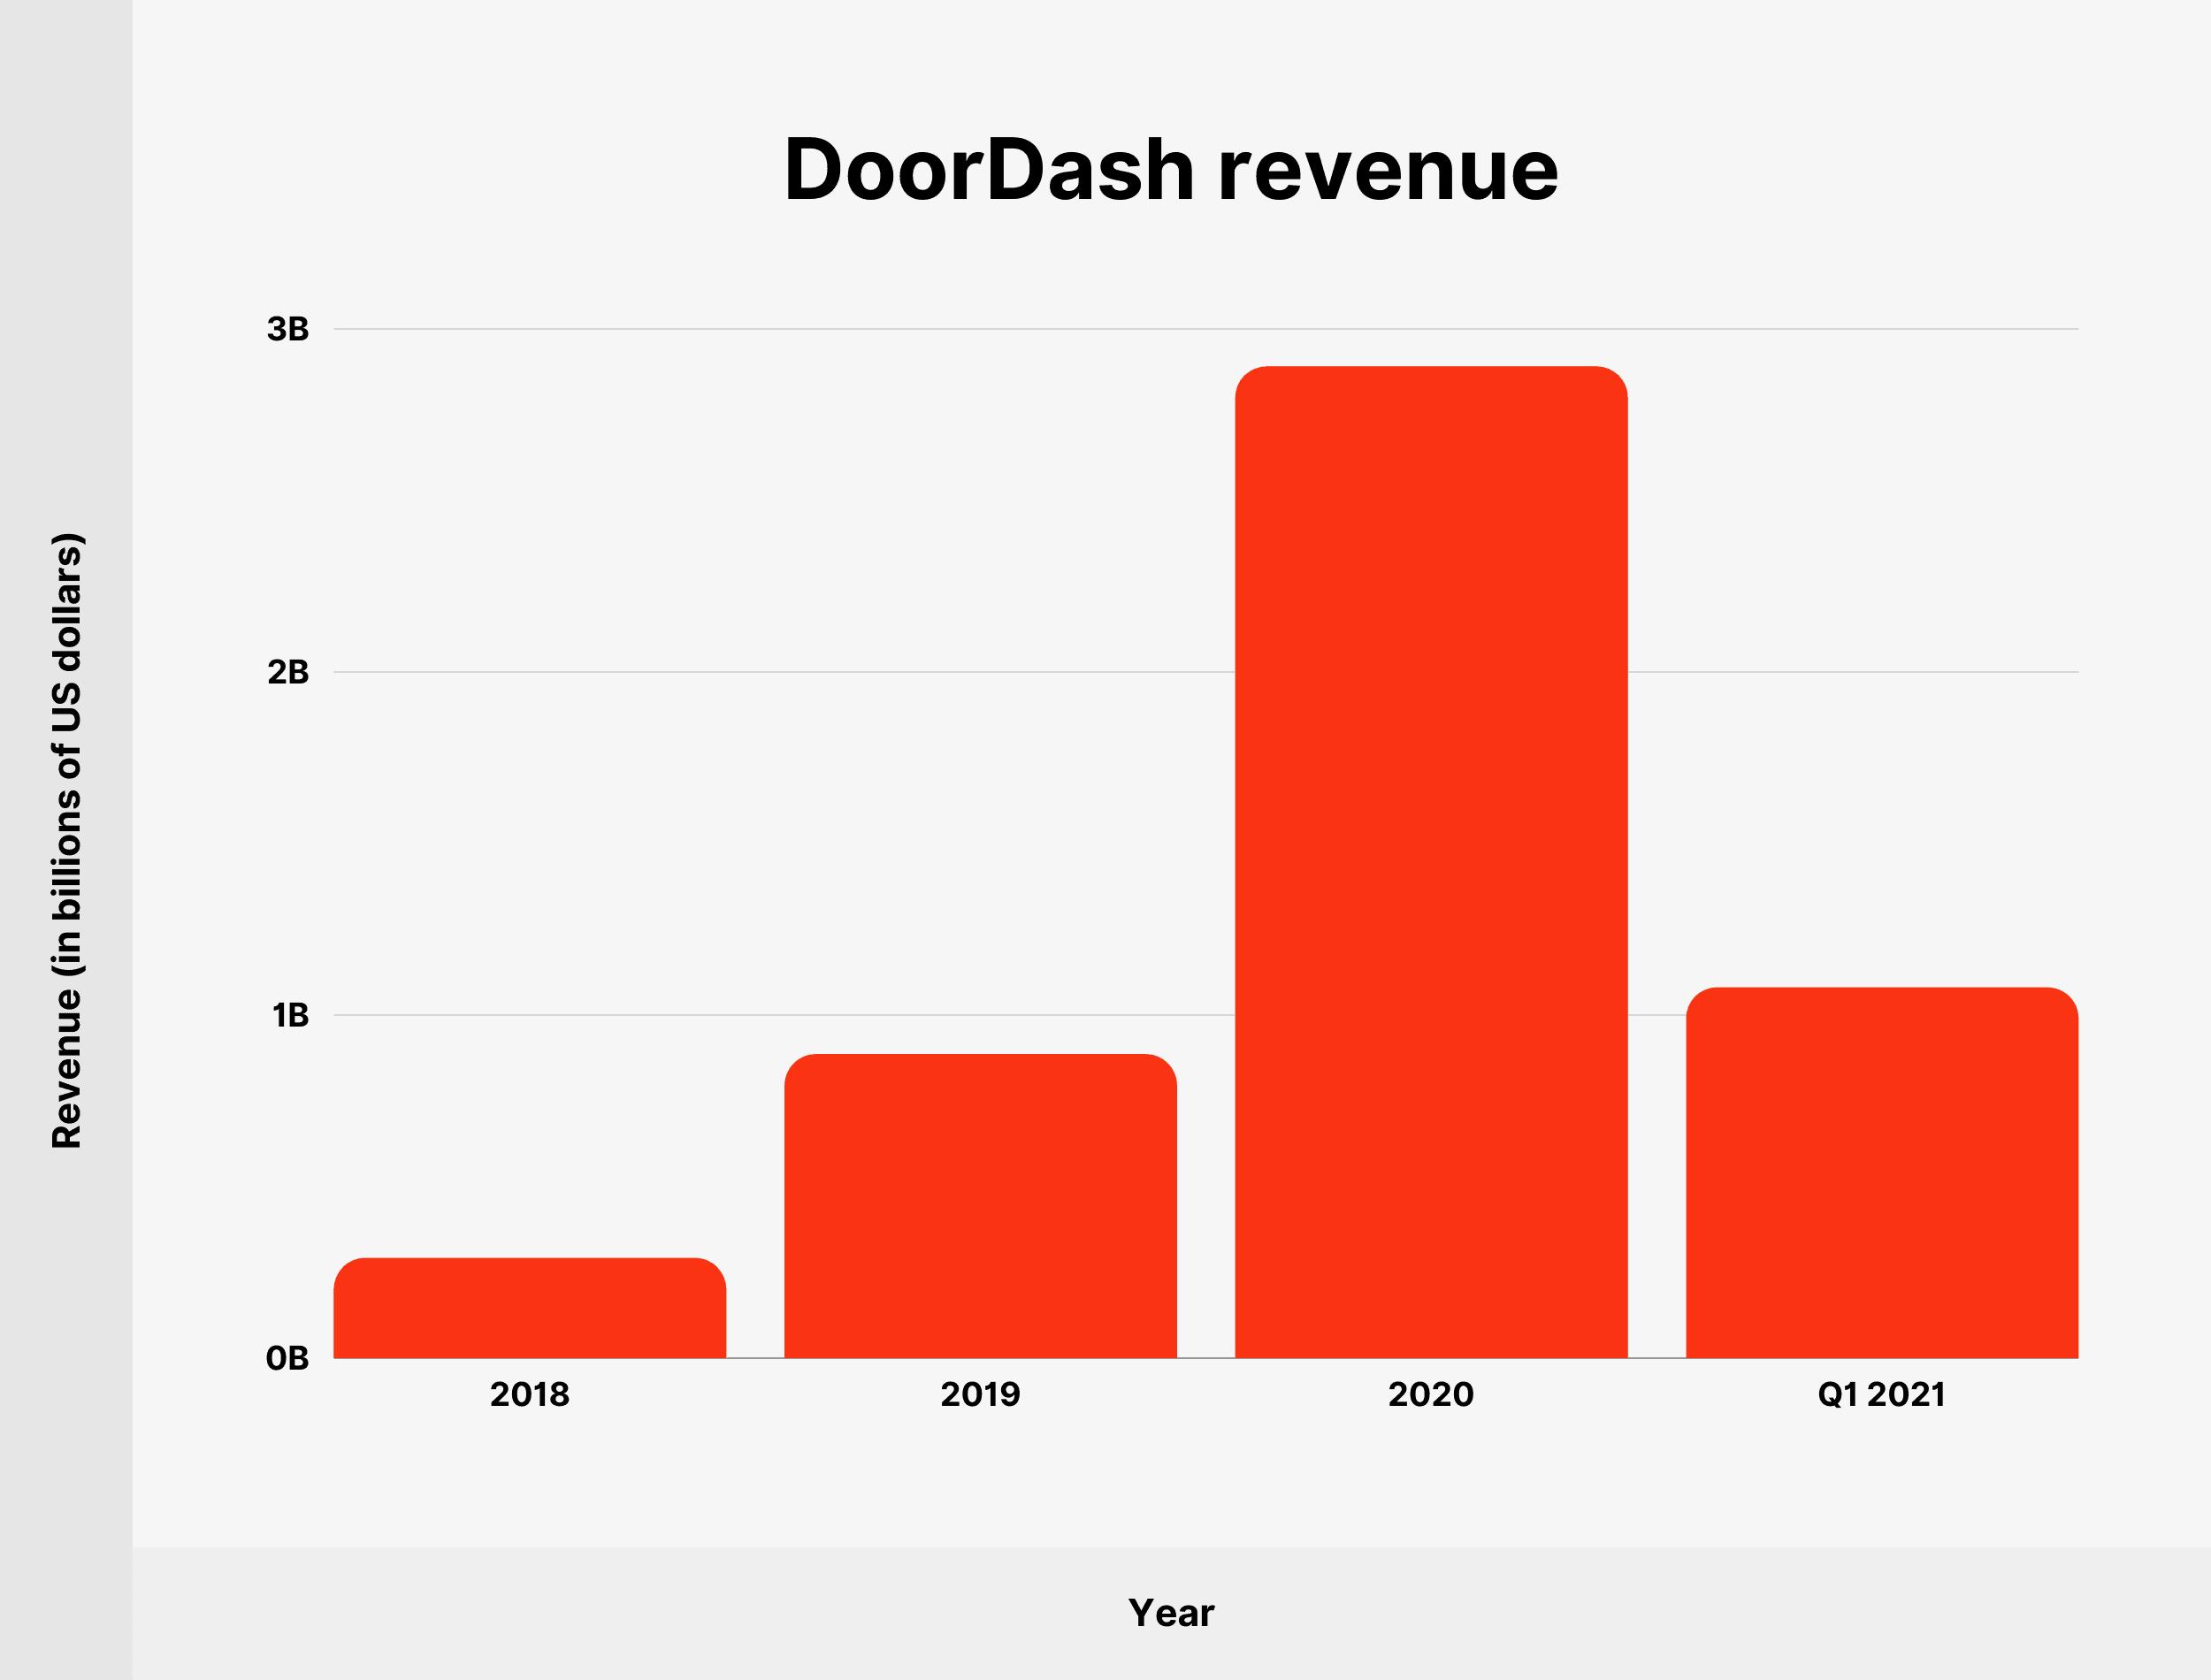 DoorDash revenue